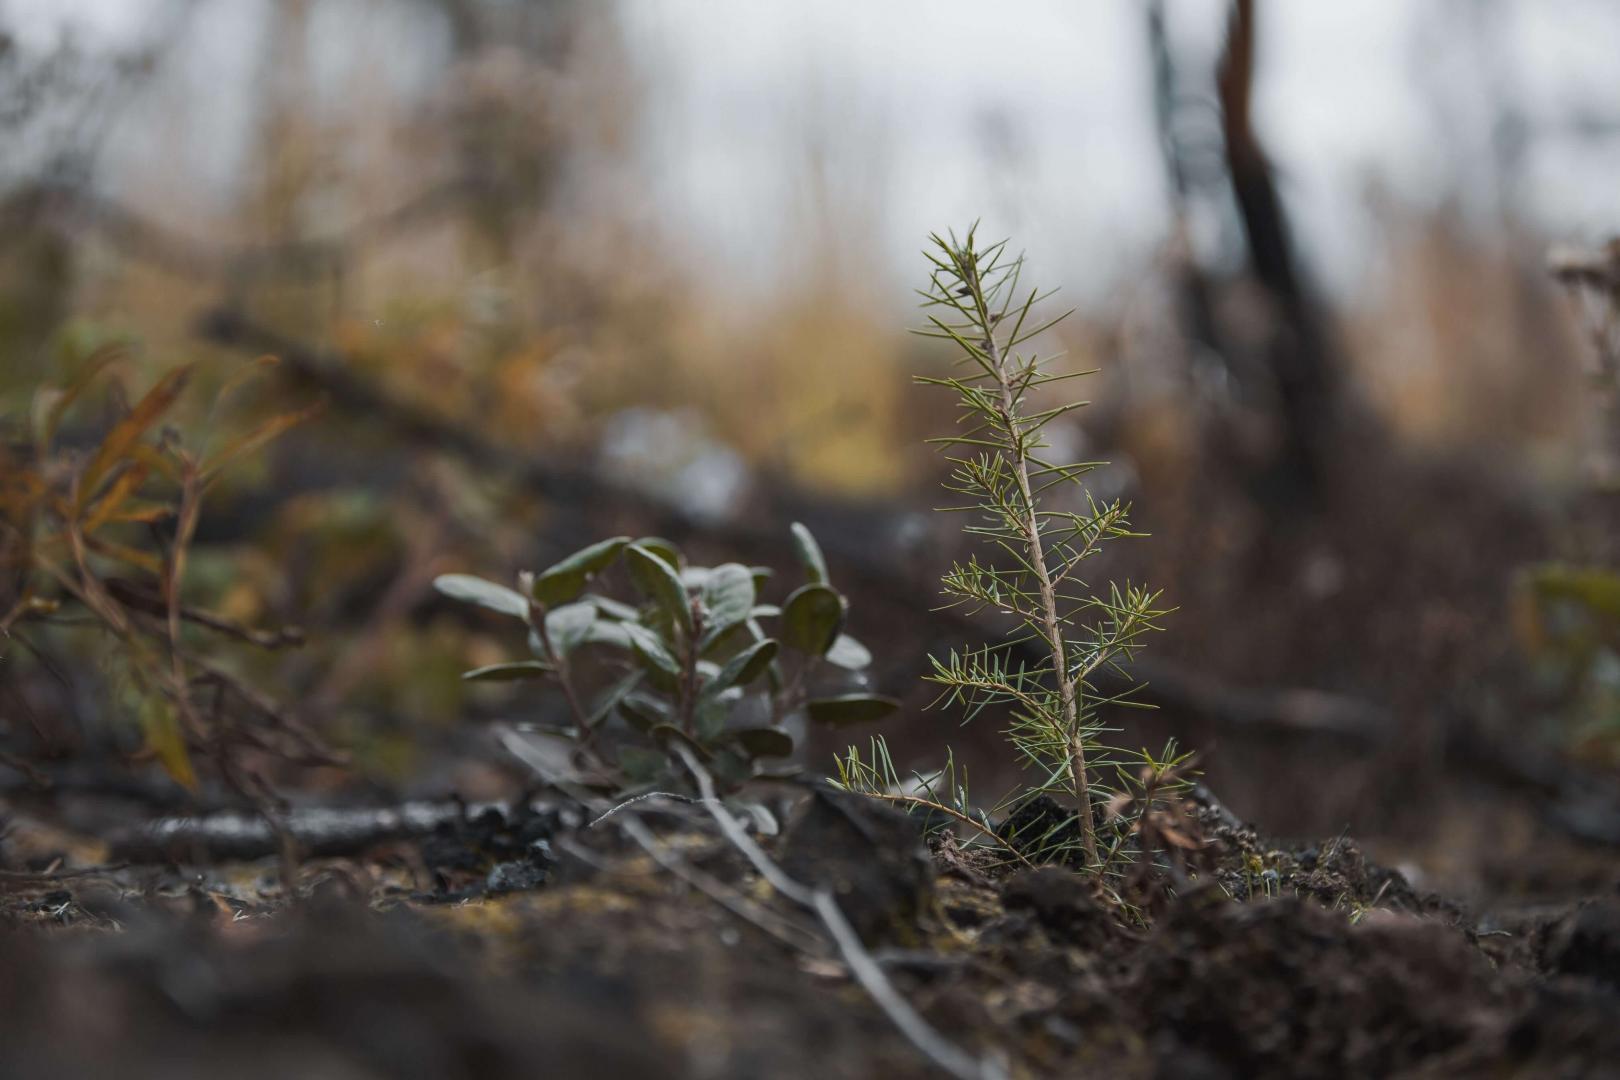 Hanceville fire reforestation